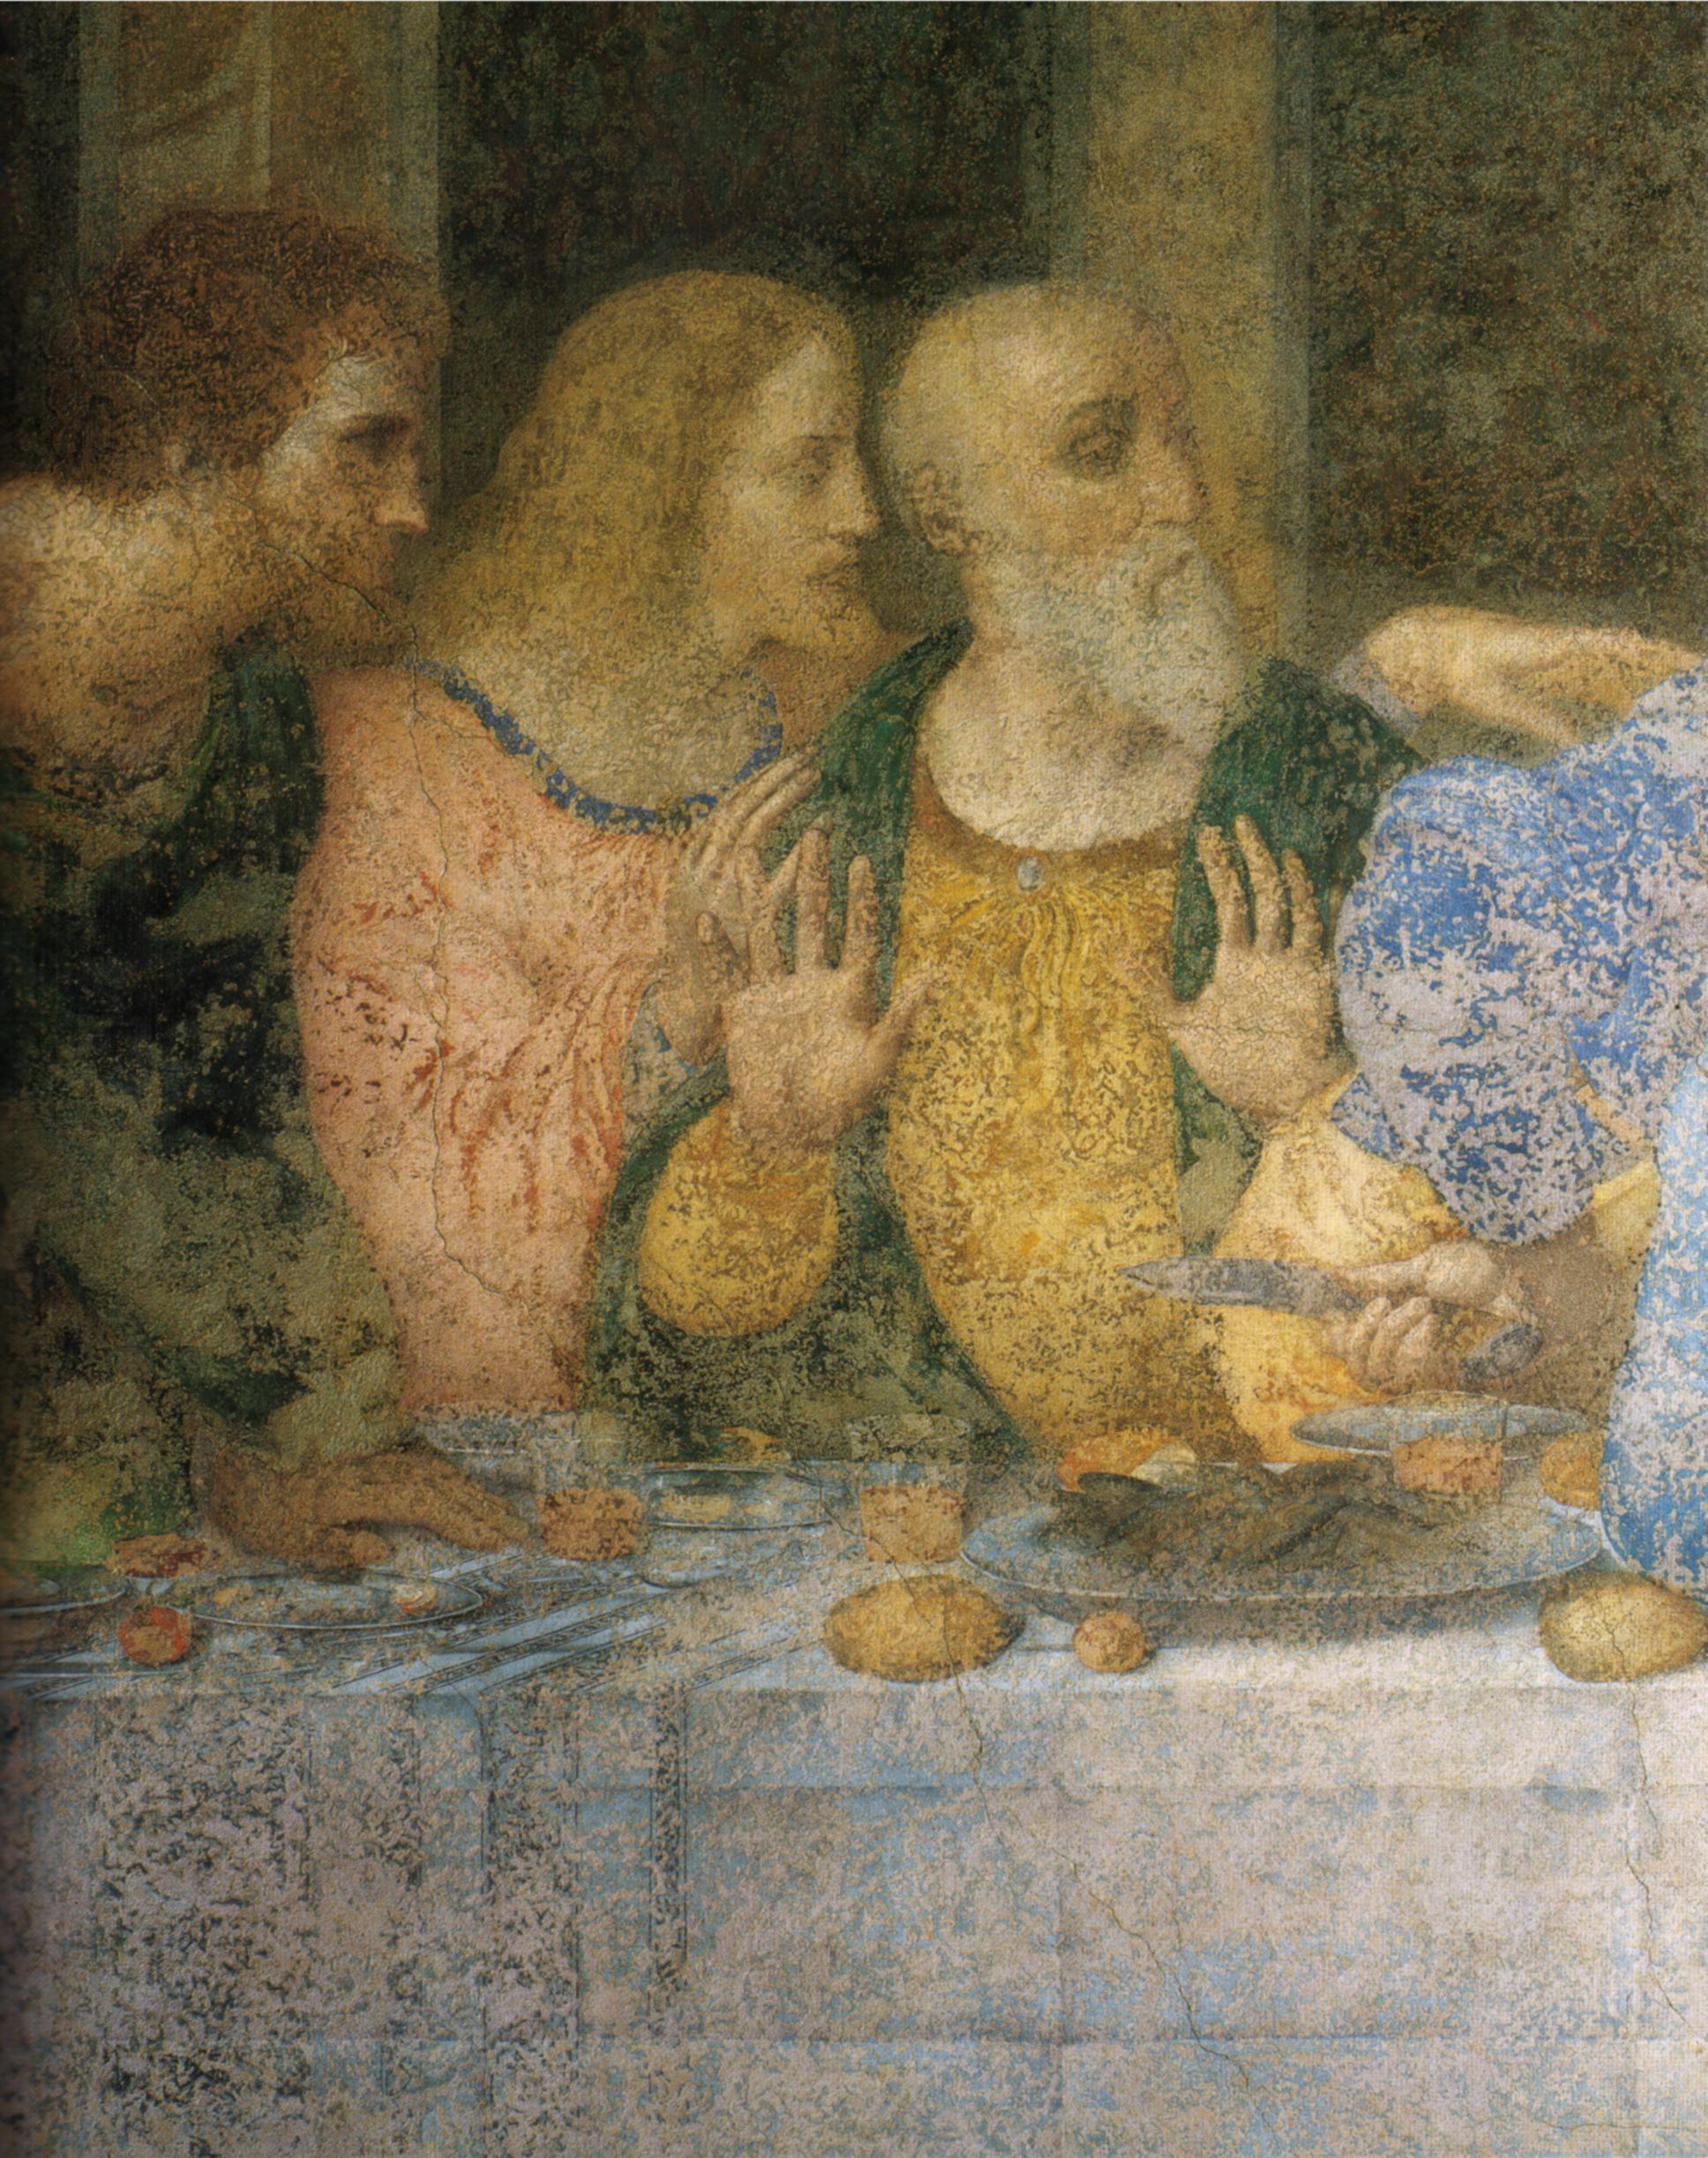 Leonardo da Vinci Painting, Anatomical, Paints, Genius, History, HQ Photo